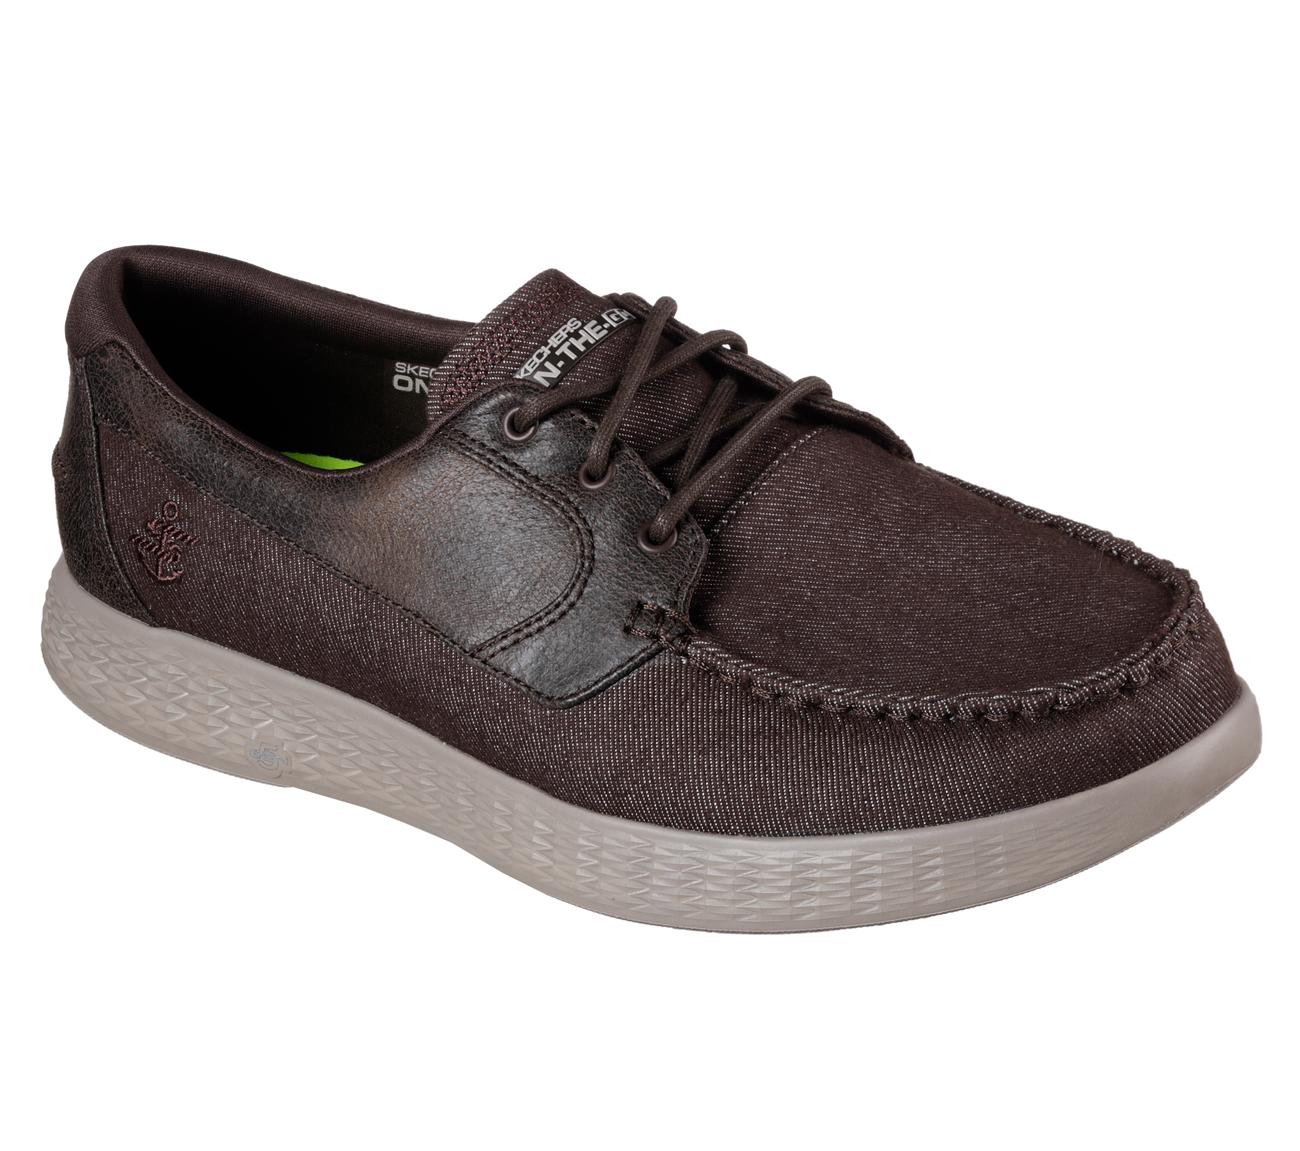 buy skechers skechers on the go glide skechers performance shoes only. Black Bedroom Furniture Sets. Home Design Ideas